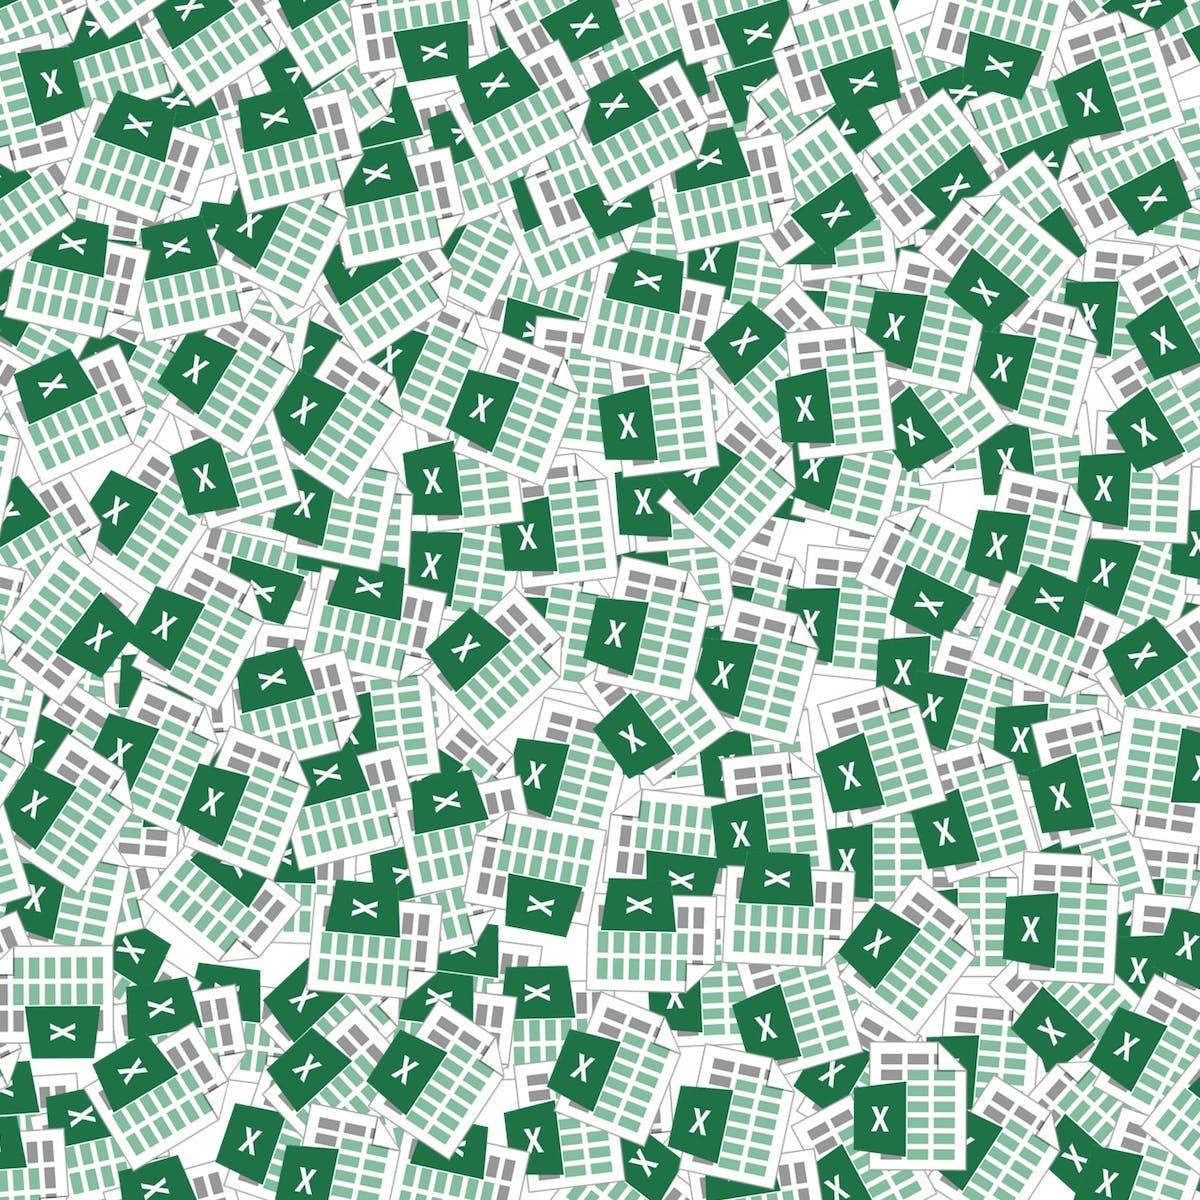 Titelbild-Excel-Dschungel-Tabellen-SAP-IBP-pixabay-1771393-EsaRiutta